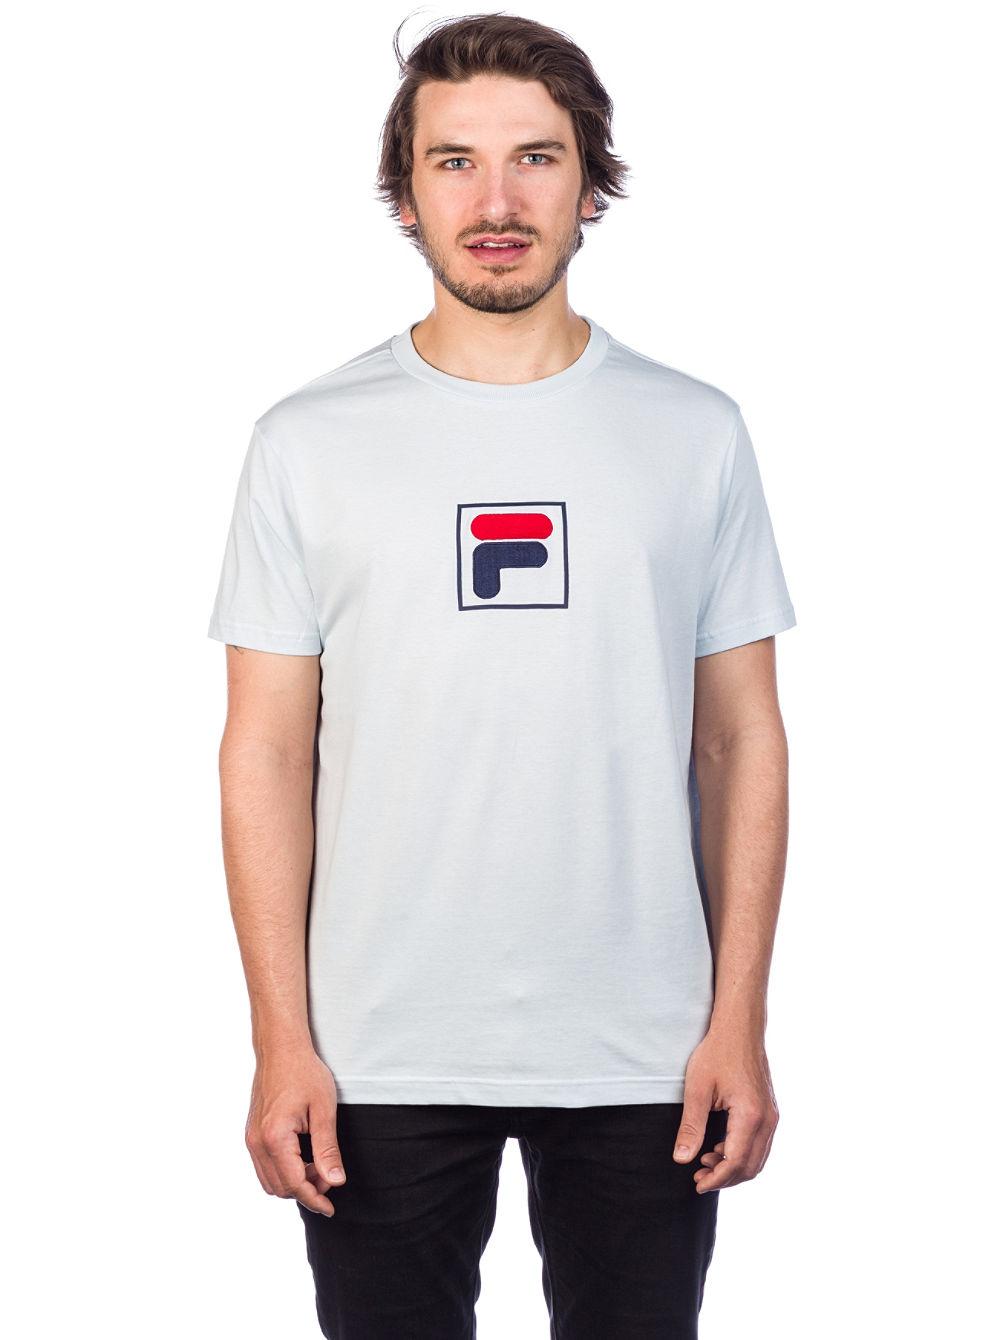 764d15aa7f Buy Fila Evan T-Shirt online at Blue Tomato